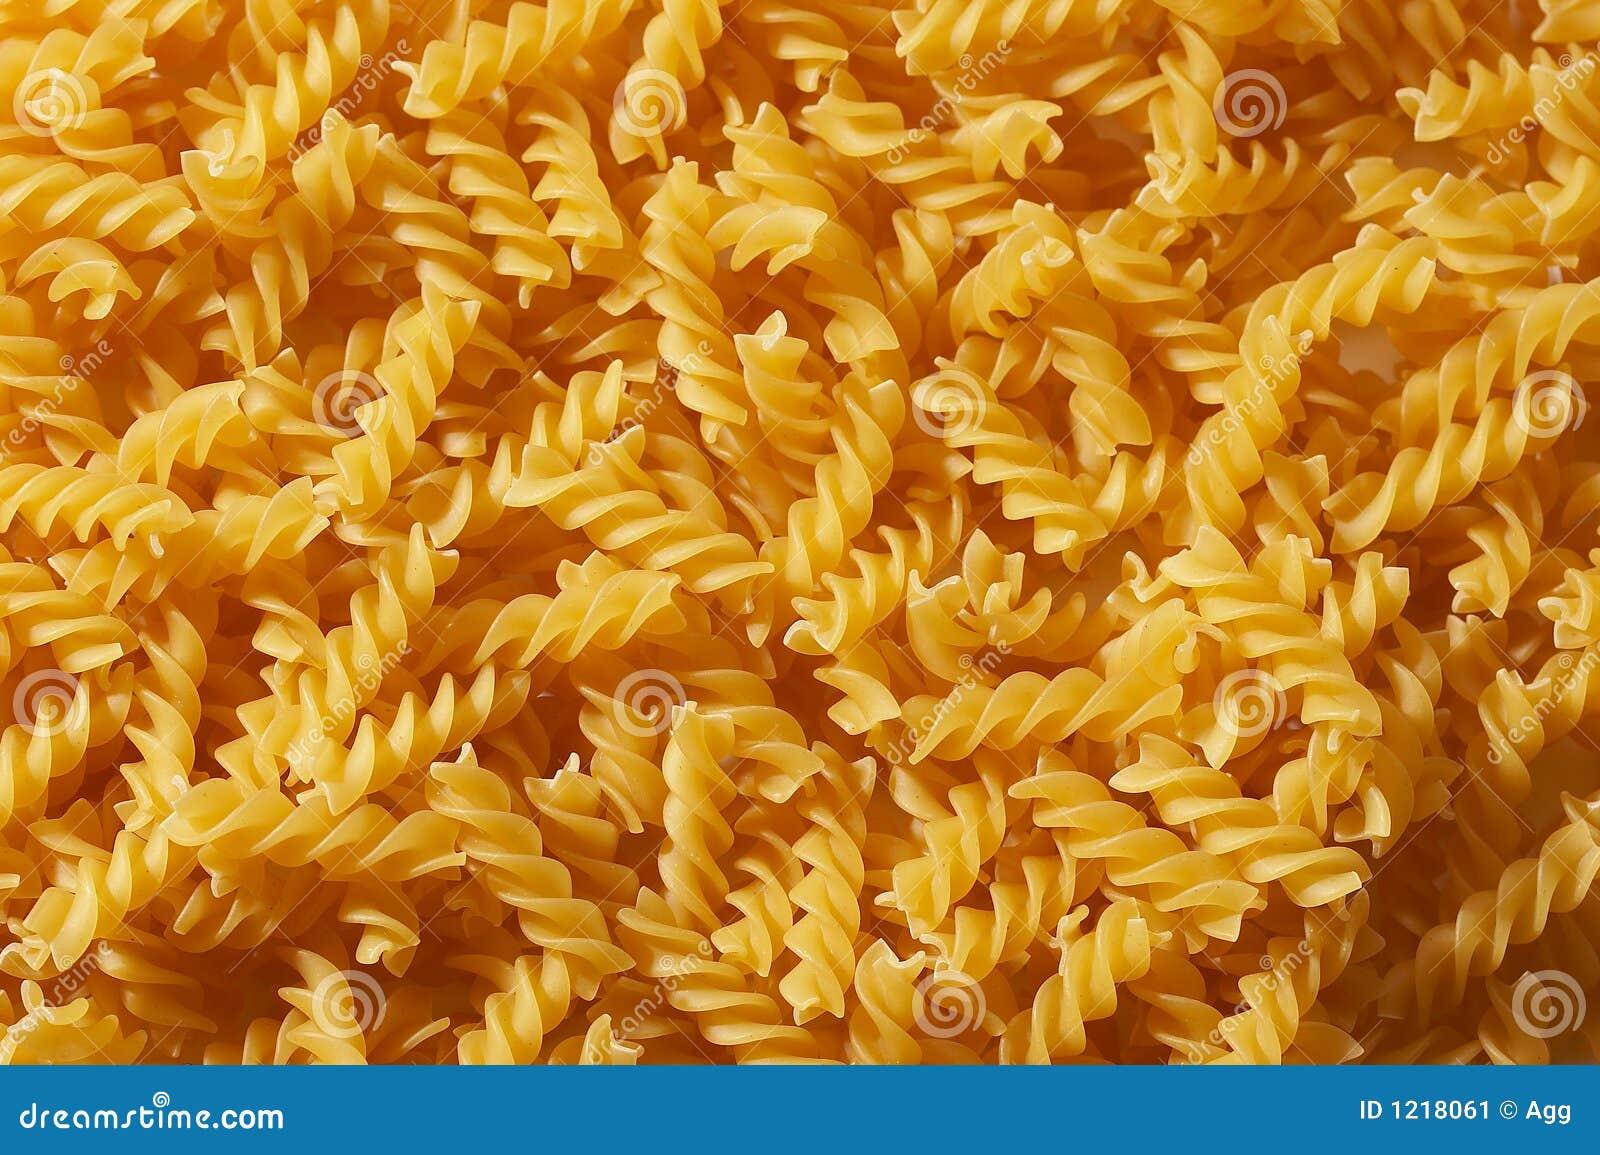 how to prepare macaroni pasta